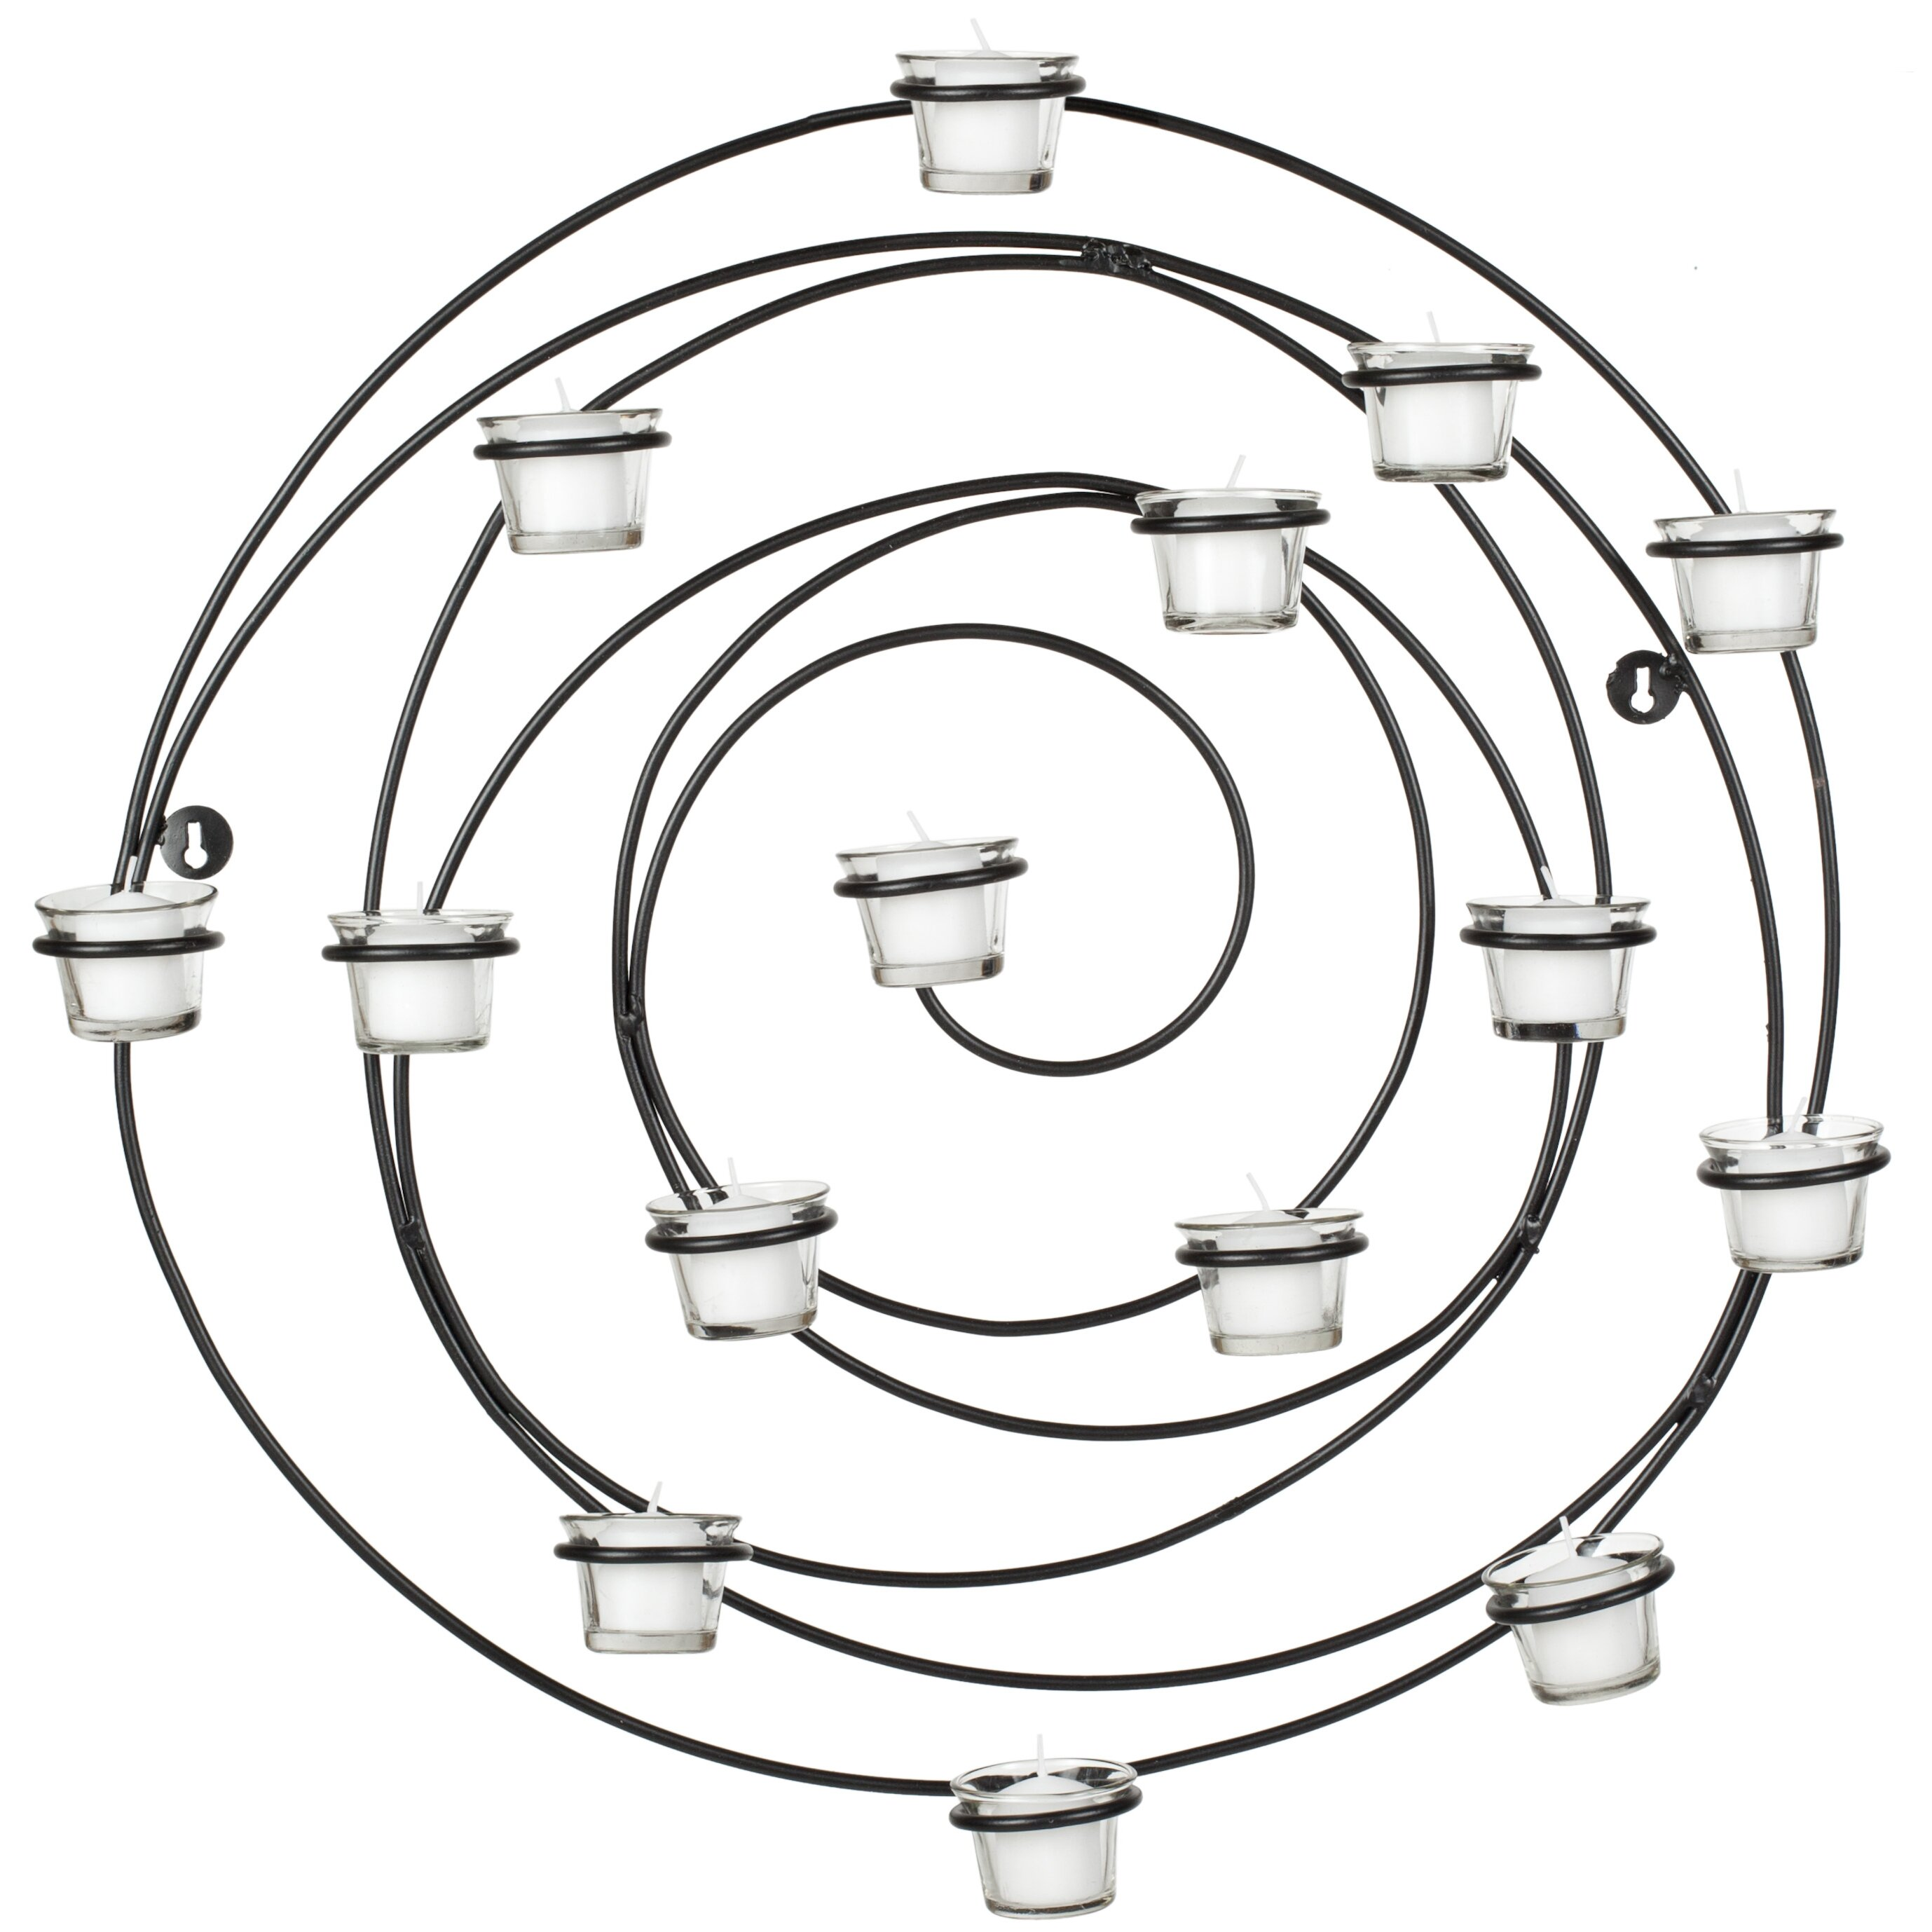 eaton manual transfer switch wiring diagram eaton discover your eaton transformer wiring diagram